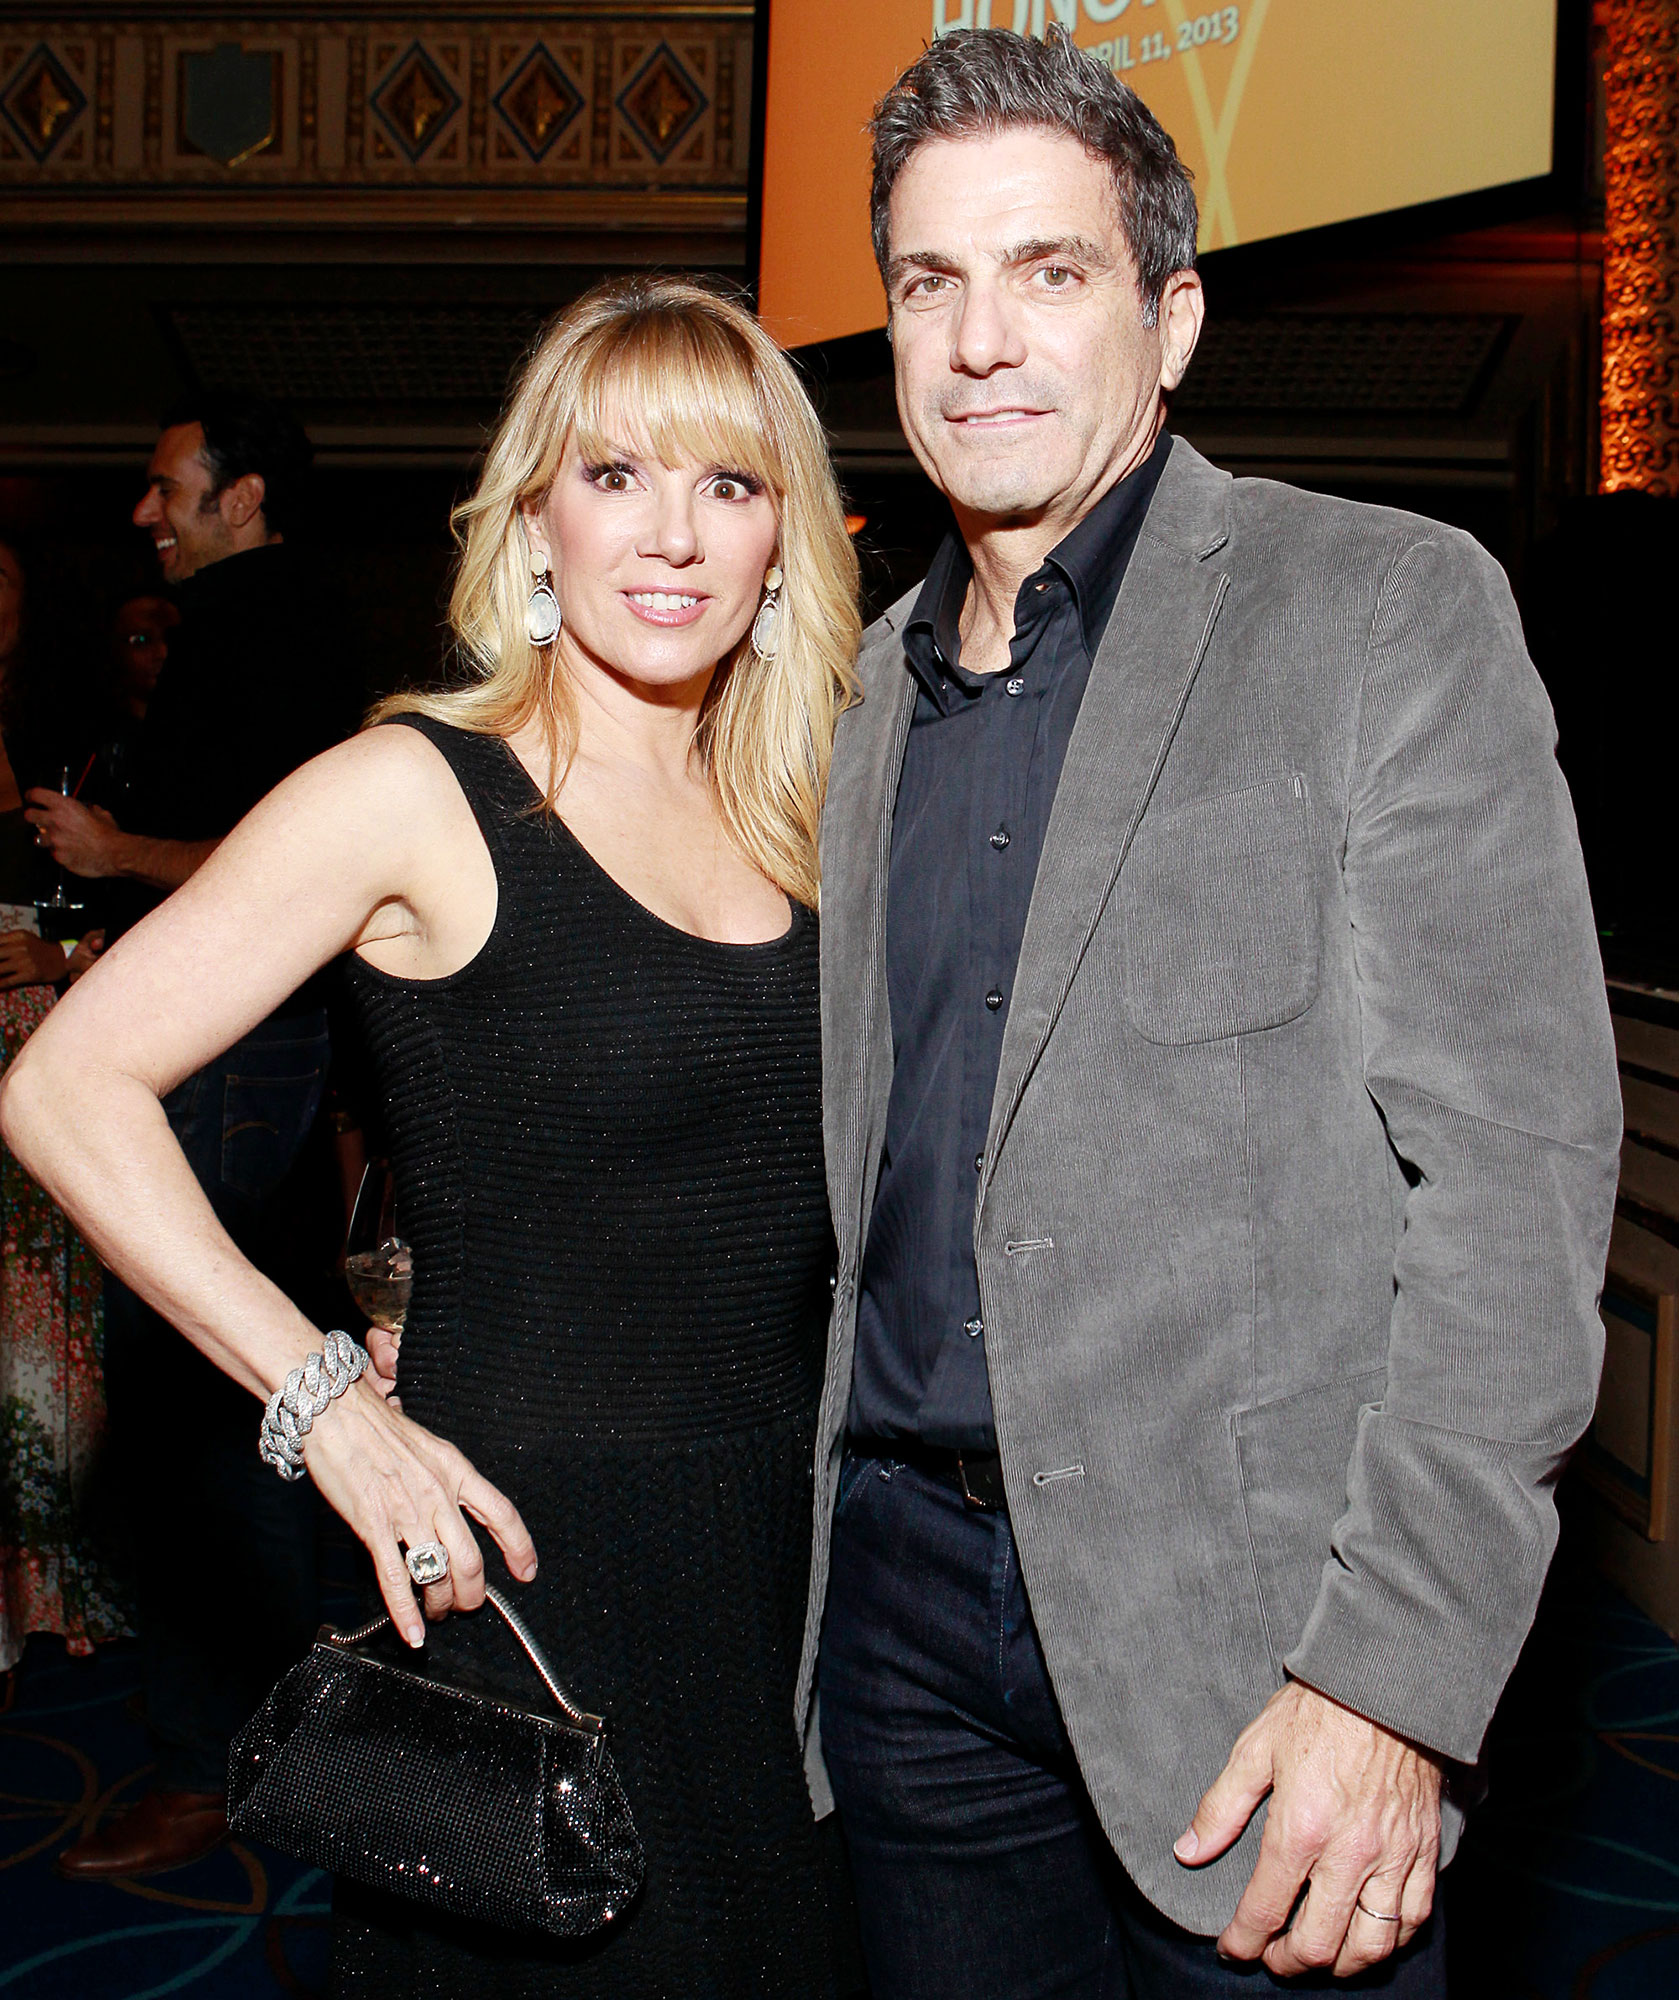 Ramona Singer and Ex-Husband Mario Quarantine Together Amid Coronavirus